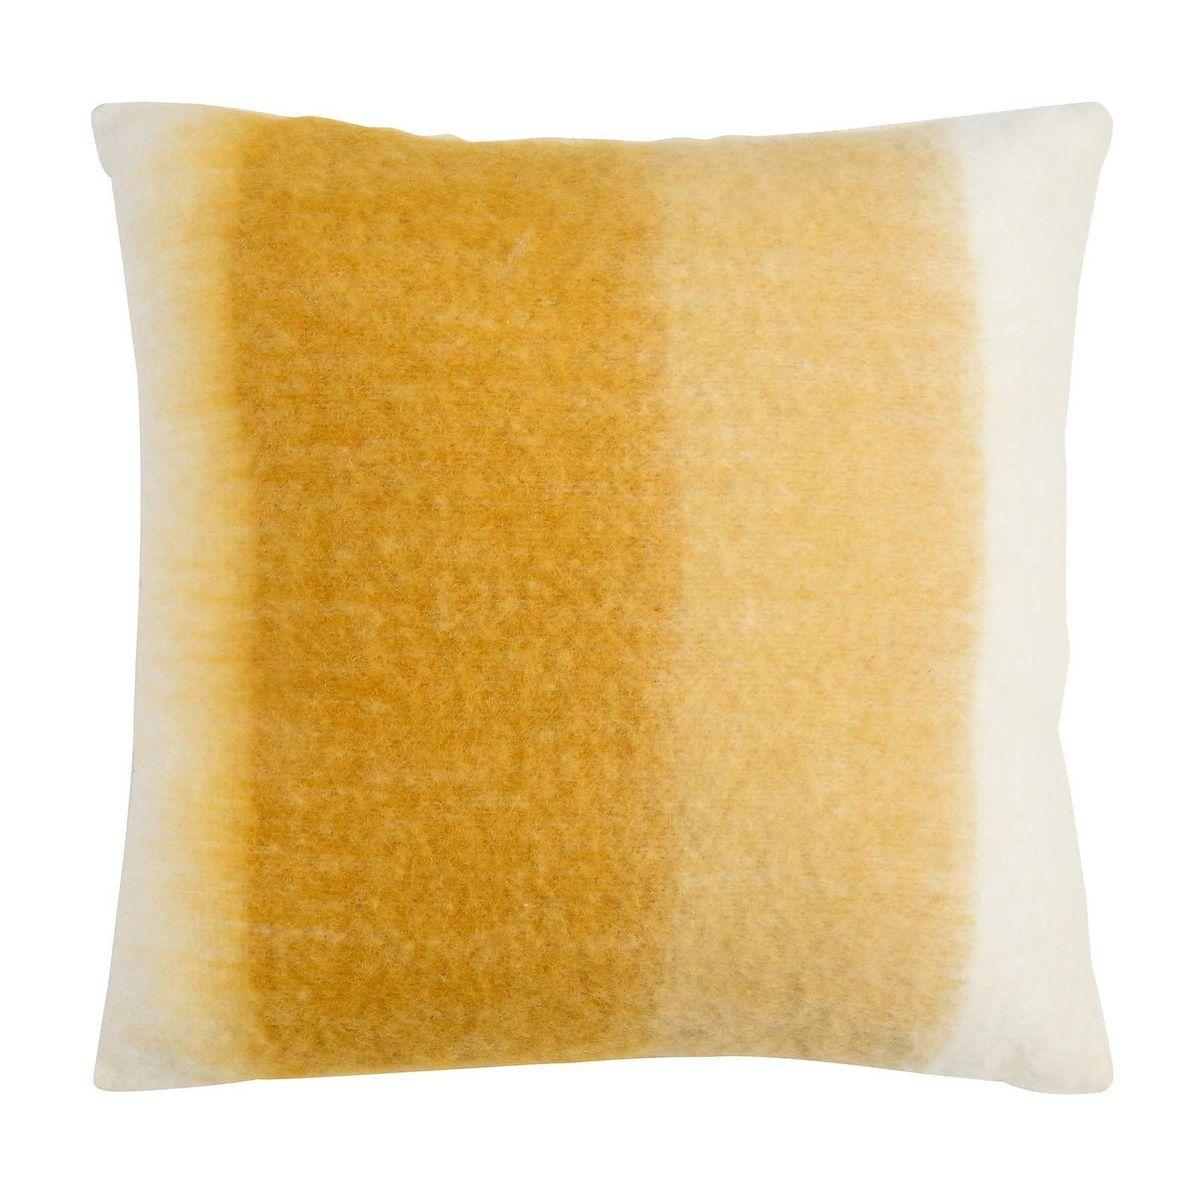 72 Neu Bild Von Senfgelb Kissen Throw Pillows Pillows Elegant